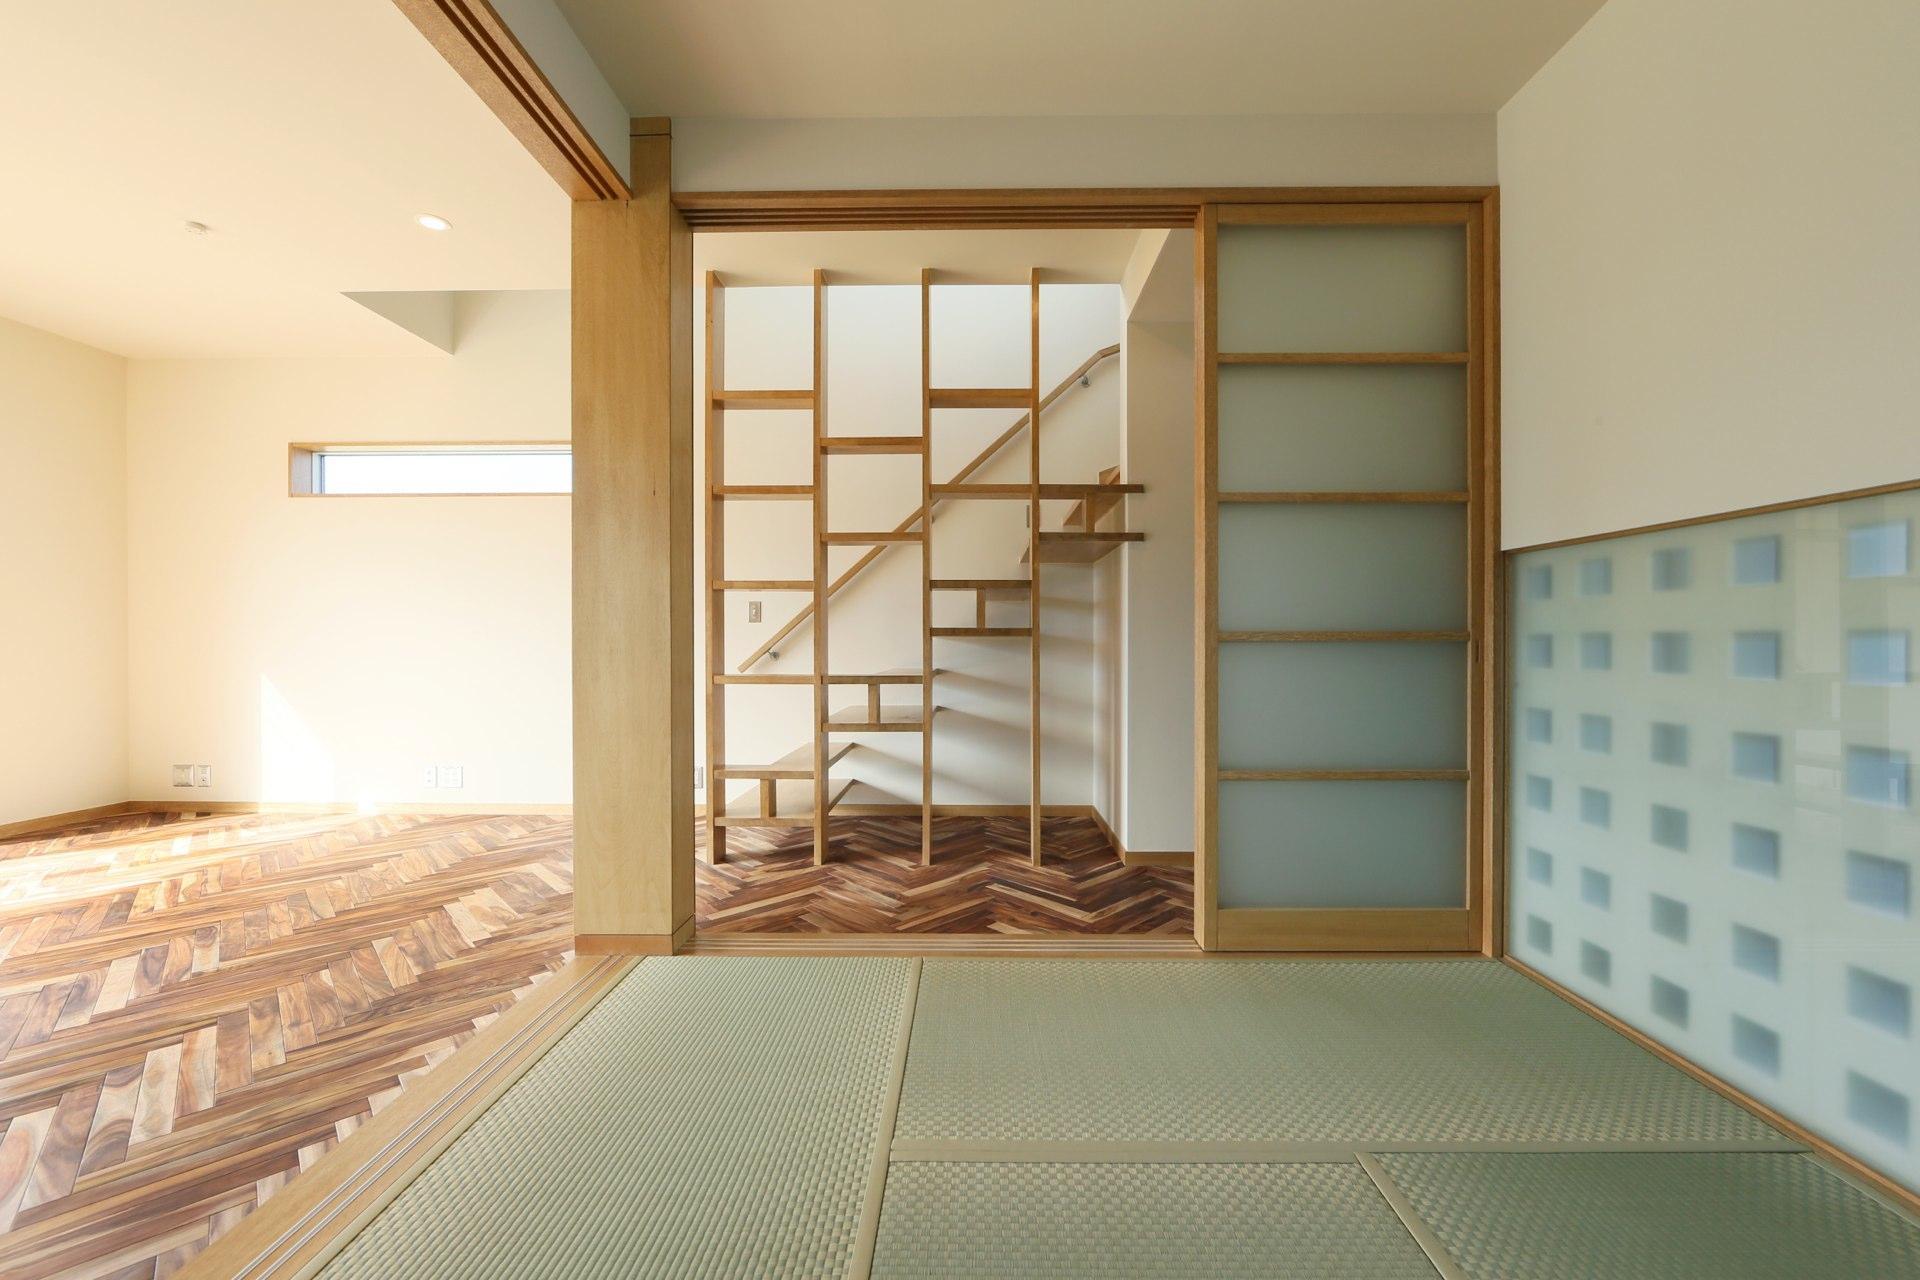 Y's residenceの写真 和室から階段を見る